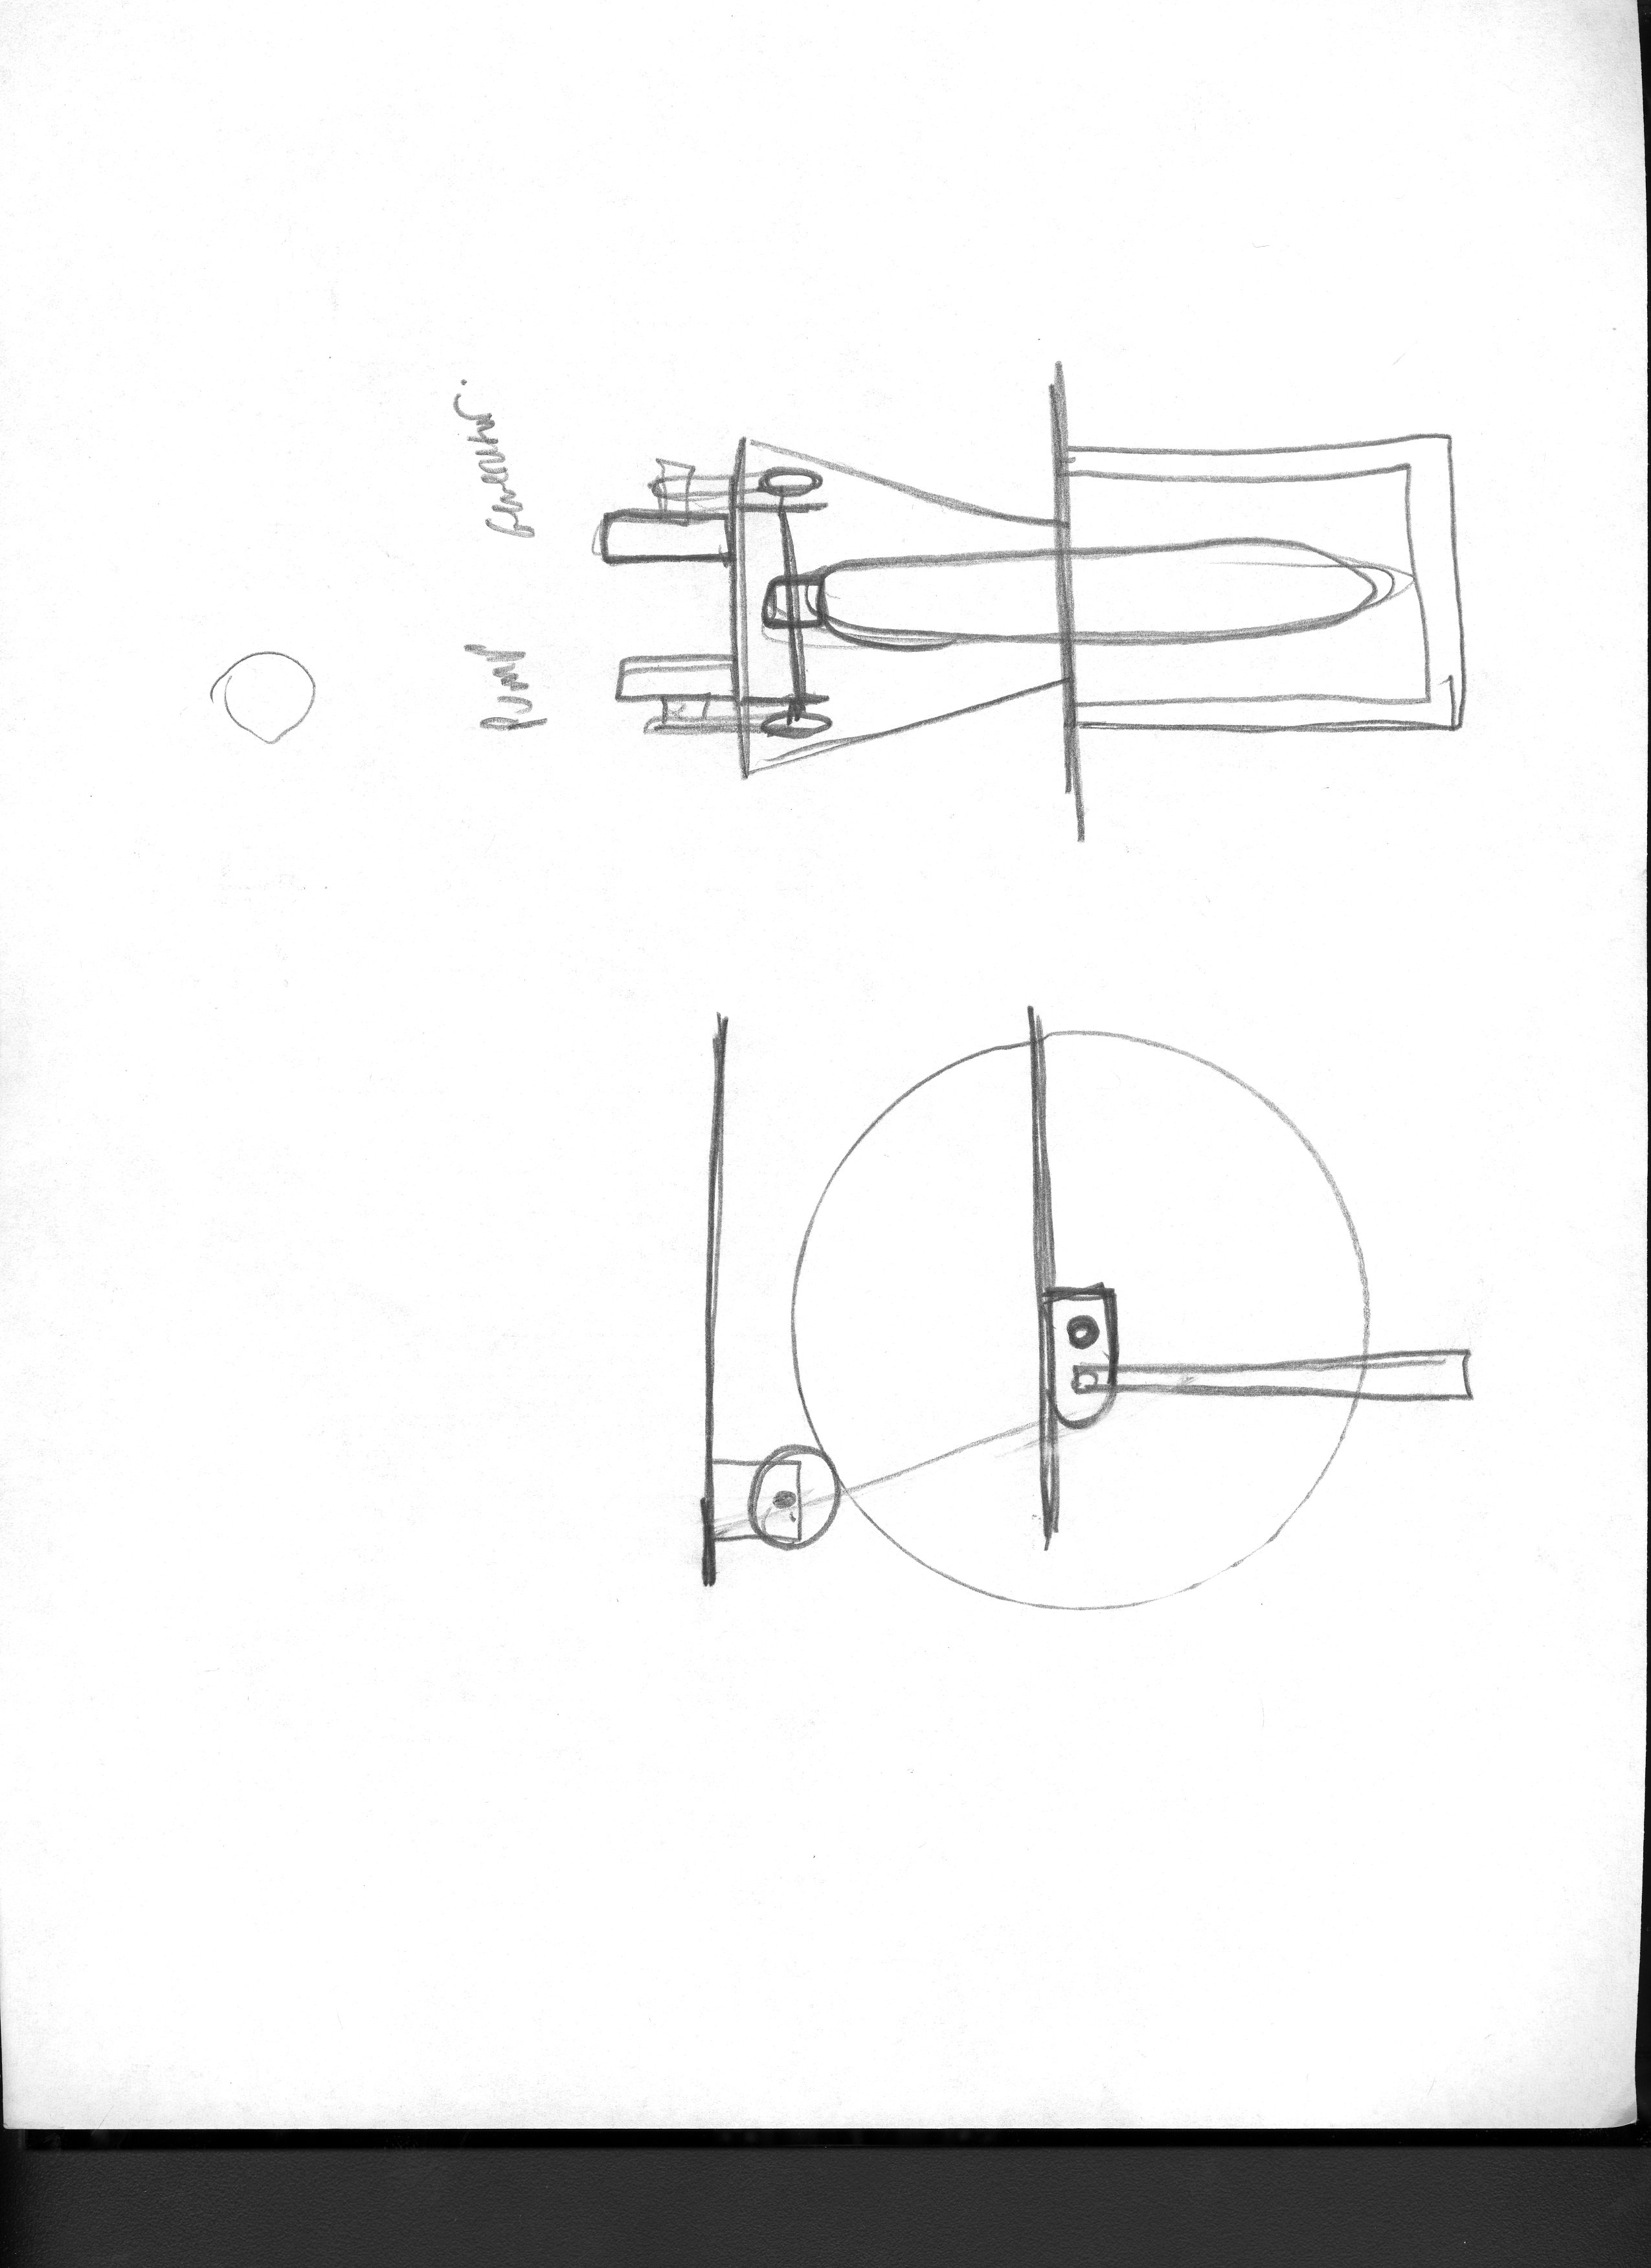 Engin Bicycle Powered Water Pump Purifier